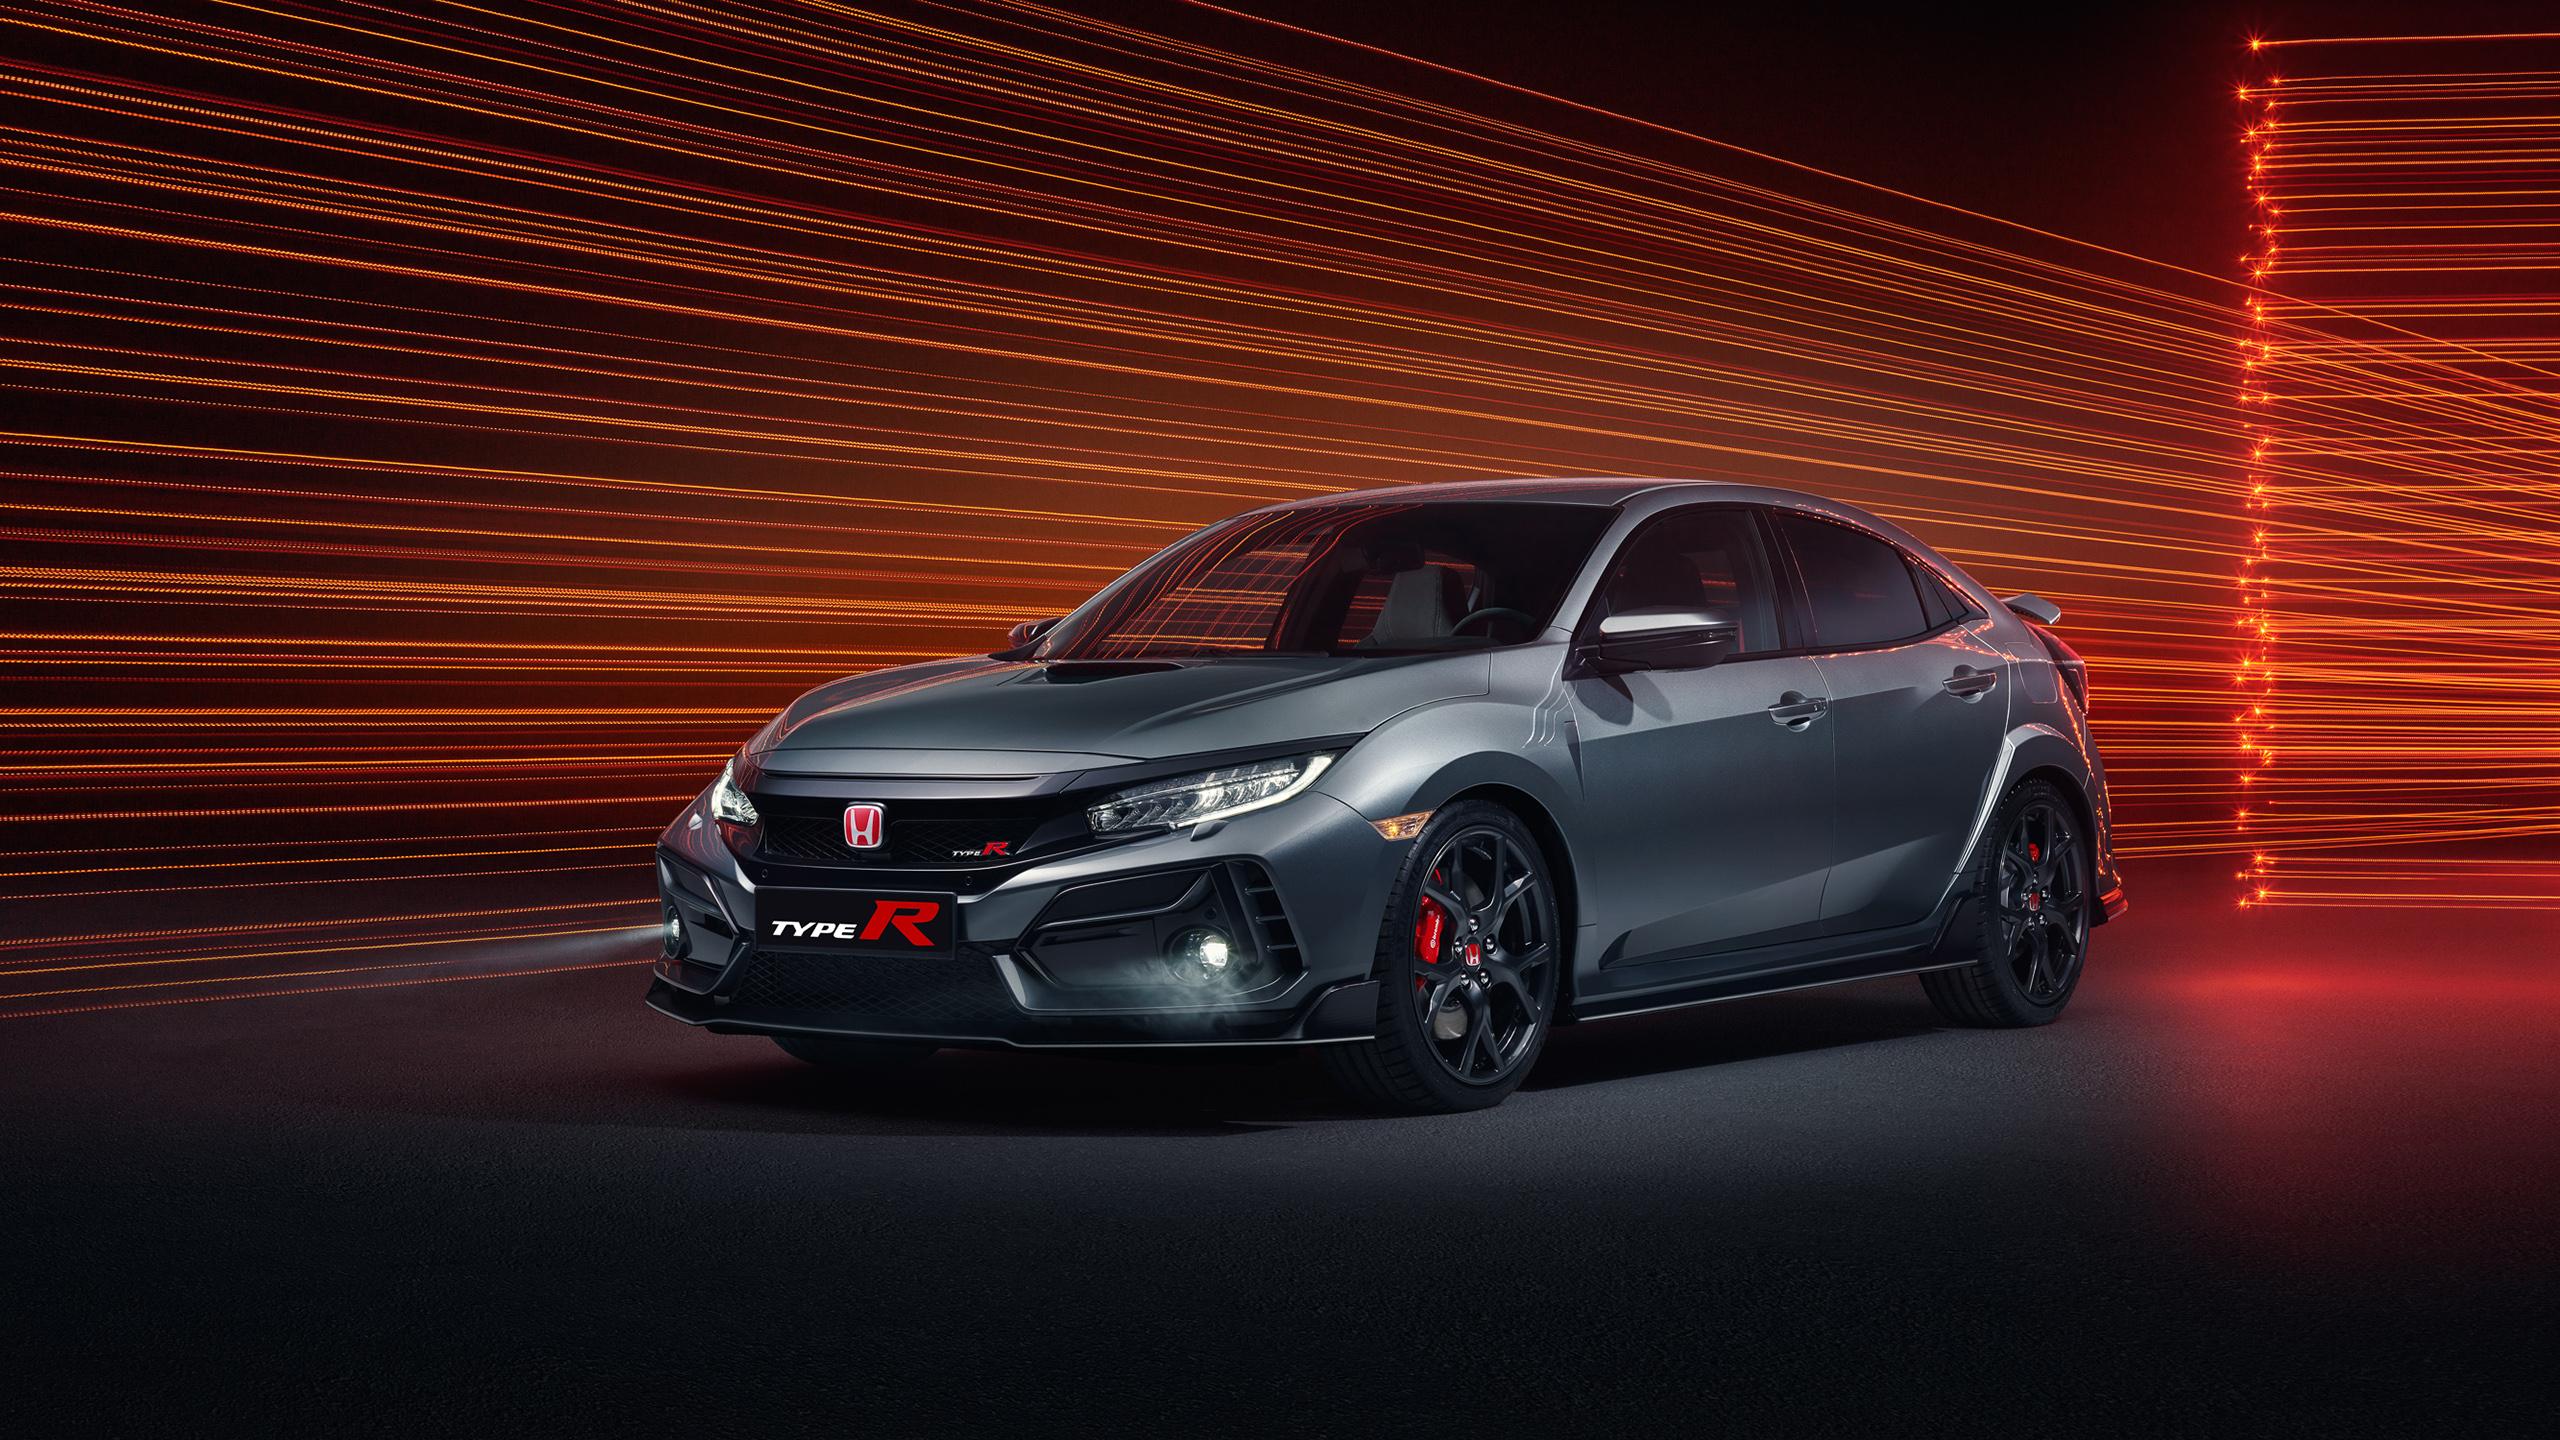 Honda Civic Type R Sport Line 2020 Wallpaper | HD Car ...